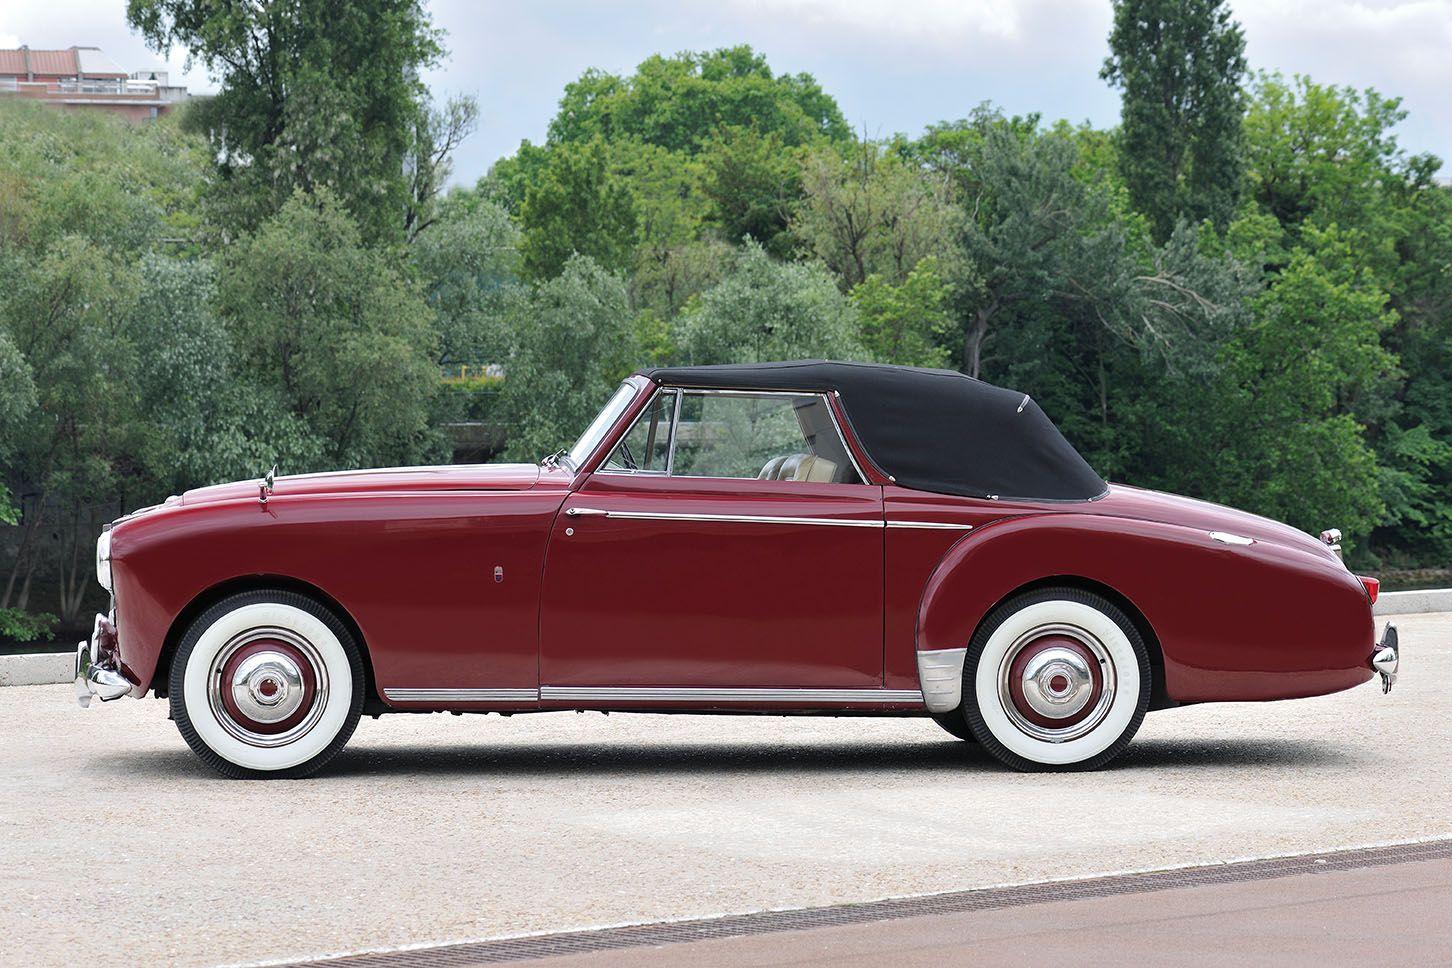 1955 Lagonda 2 6 3 Litre 2 9l Convertible By Tickford Aston Martin Cars Uk Aston Martin Lagonda